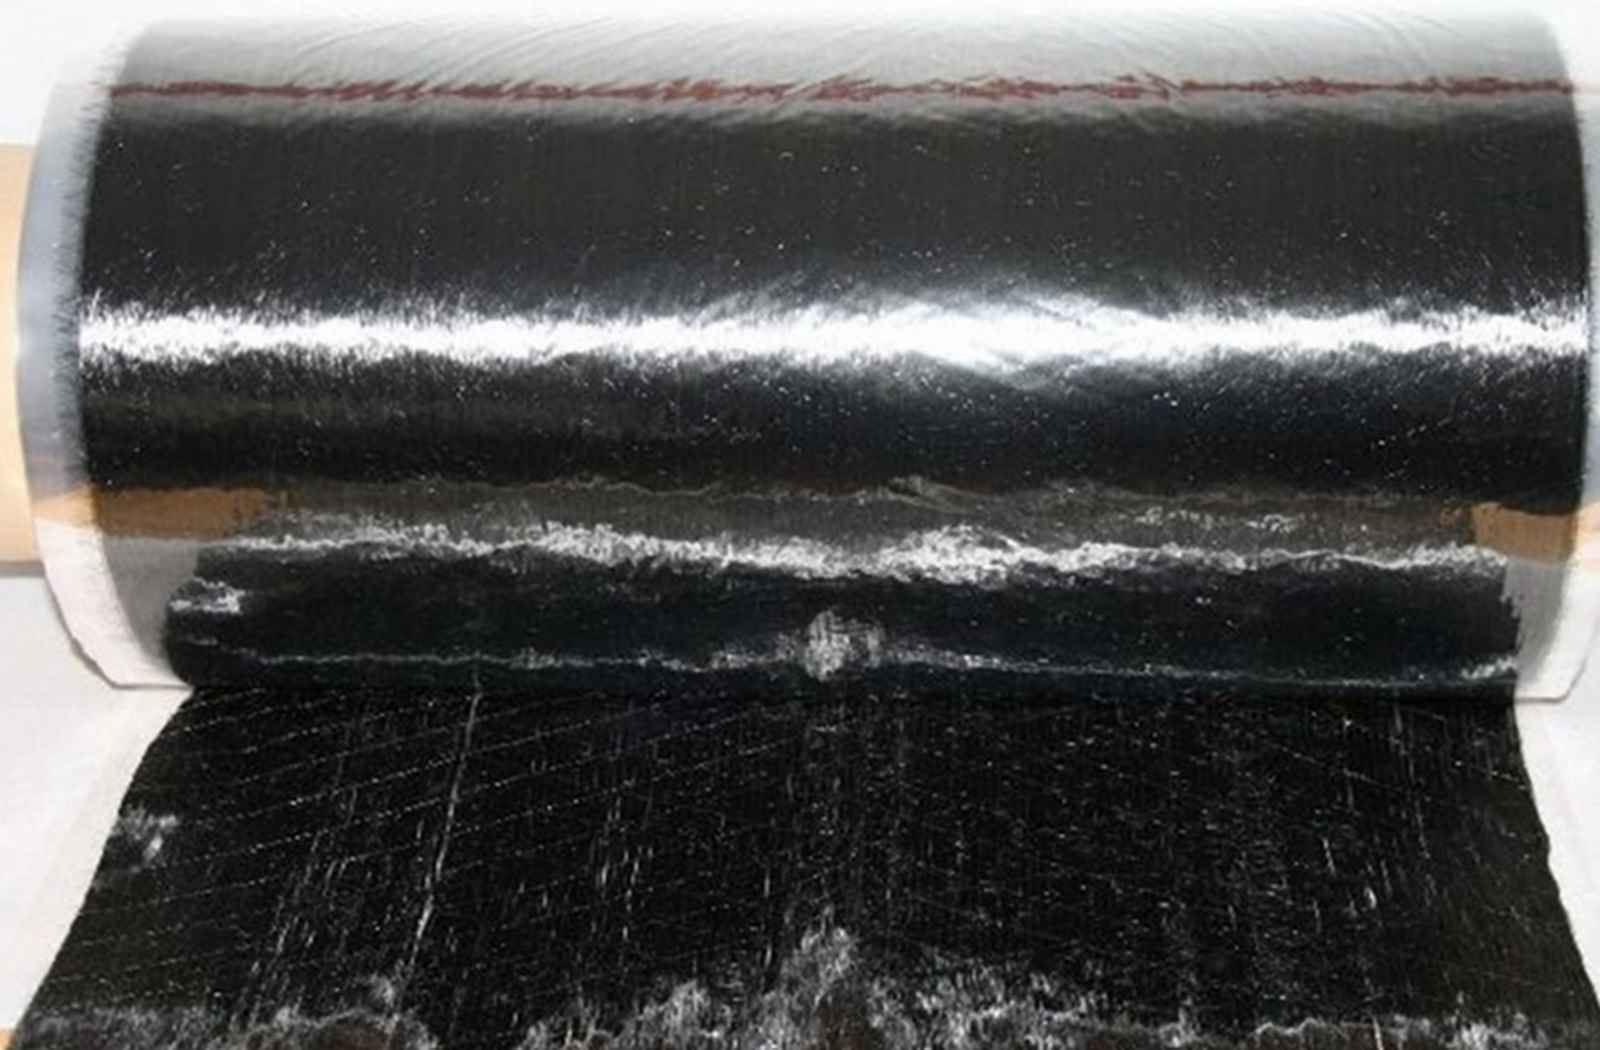 25 lfm Carbongelege UD 50 g/m² Breite 50 cm cm 50 Stiefelbau Yachtbau Sportgeräte Rohre 259765